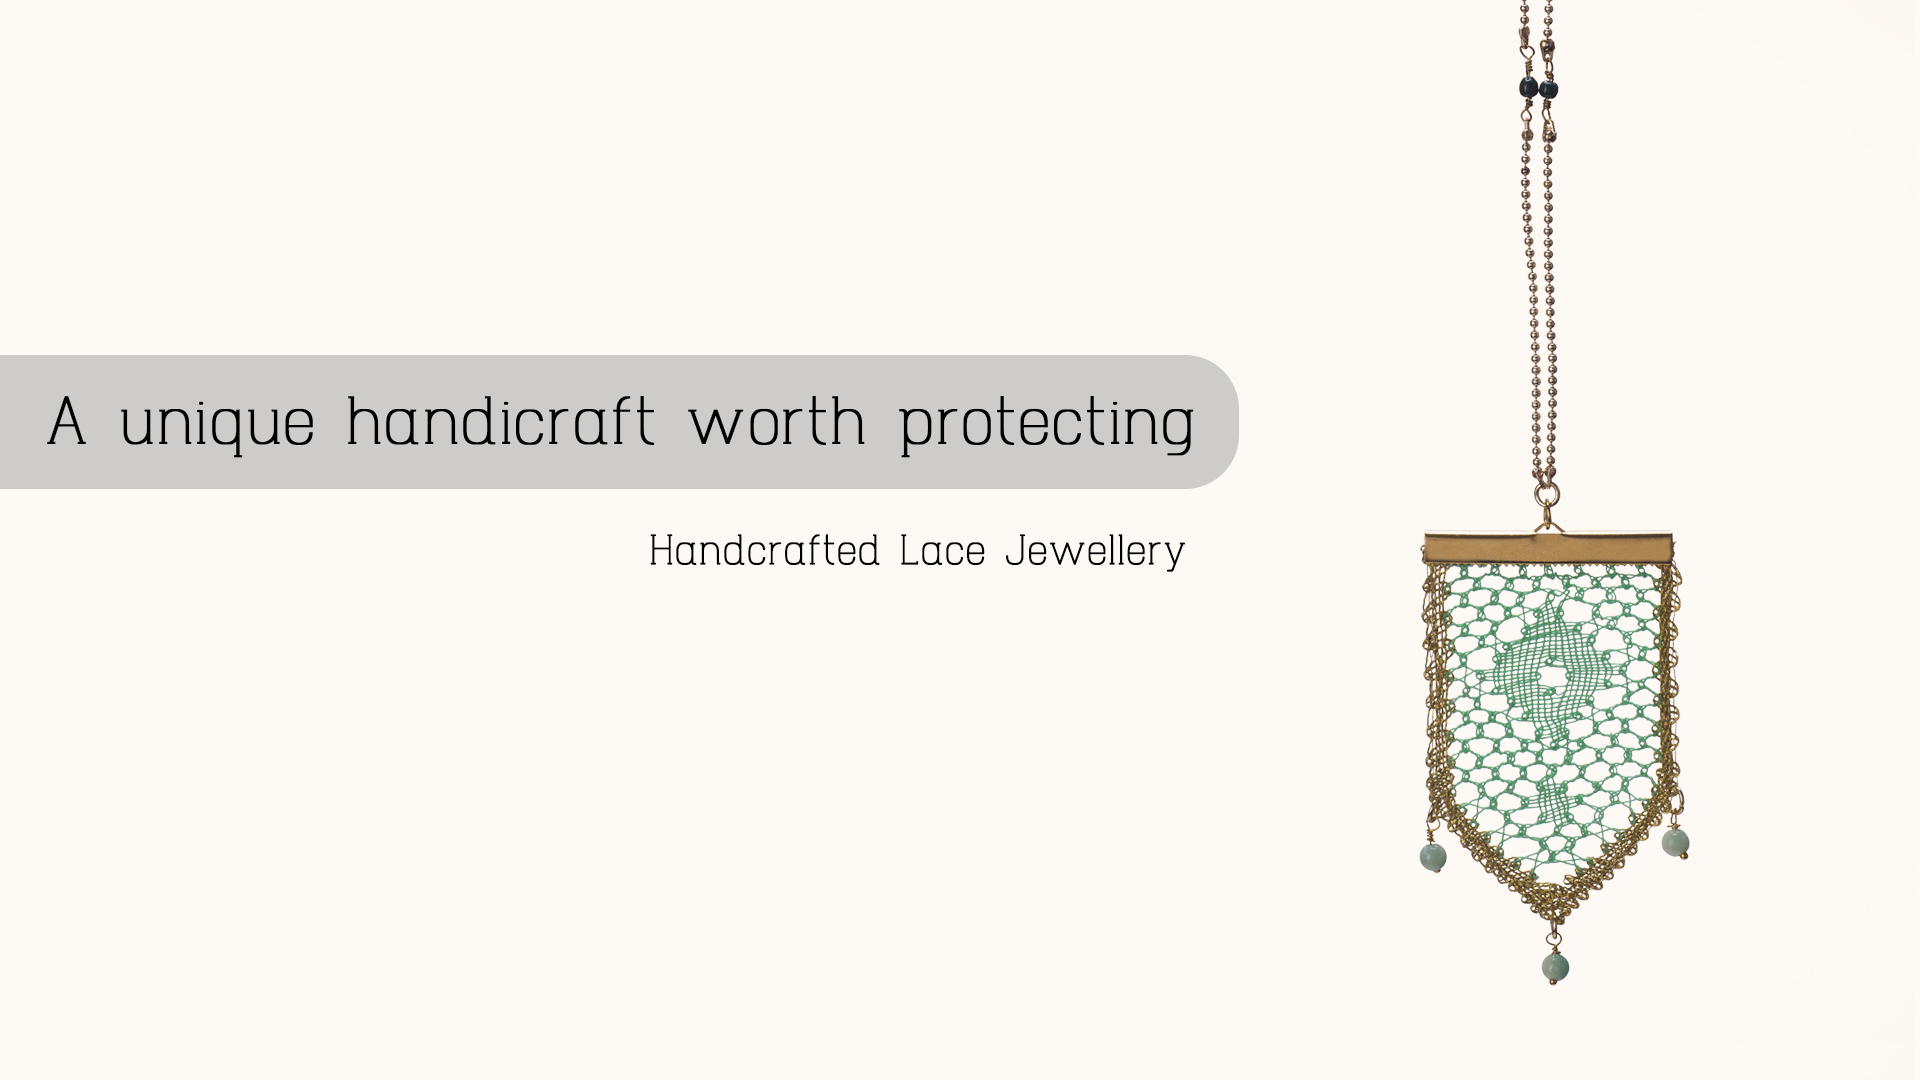 homepage-image-jewellery-1